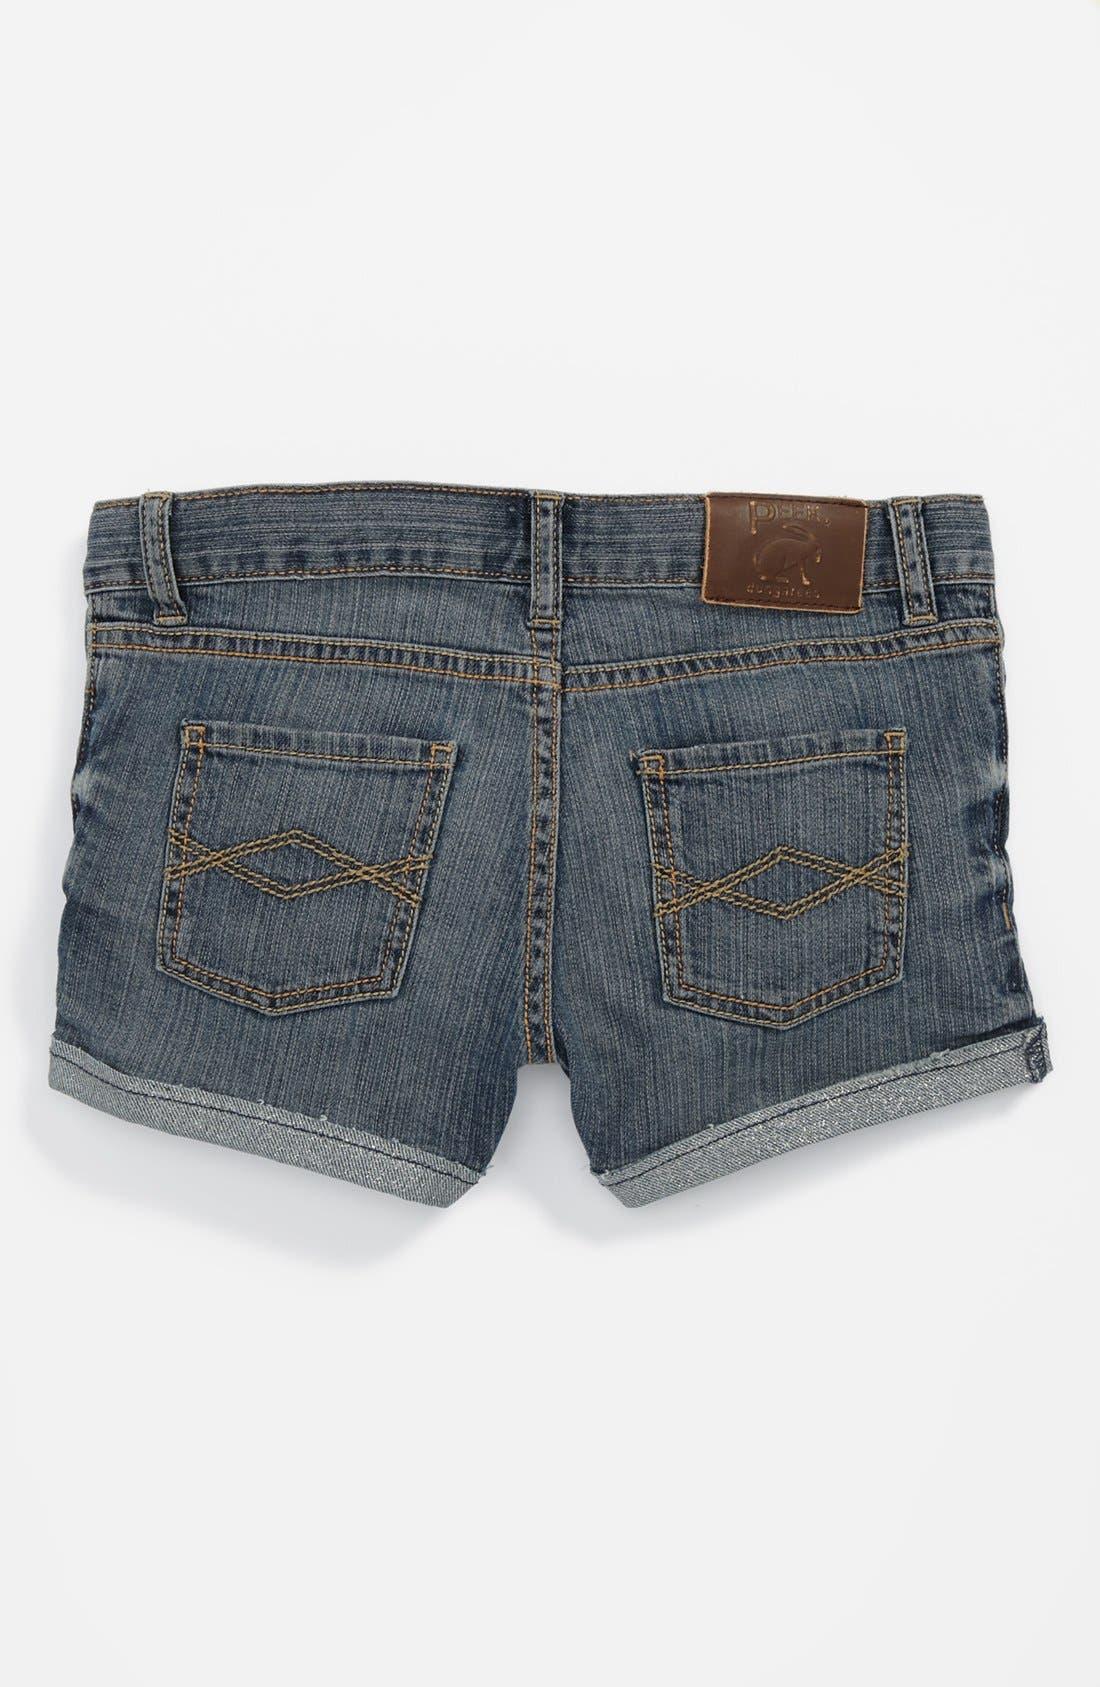 Alternate Image 1 Selected - Peek 'New Morgan' Denim Shorts (Big Girls)